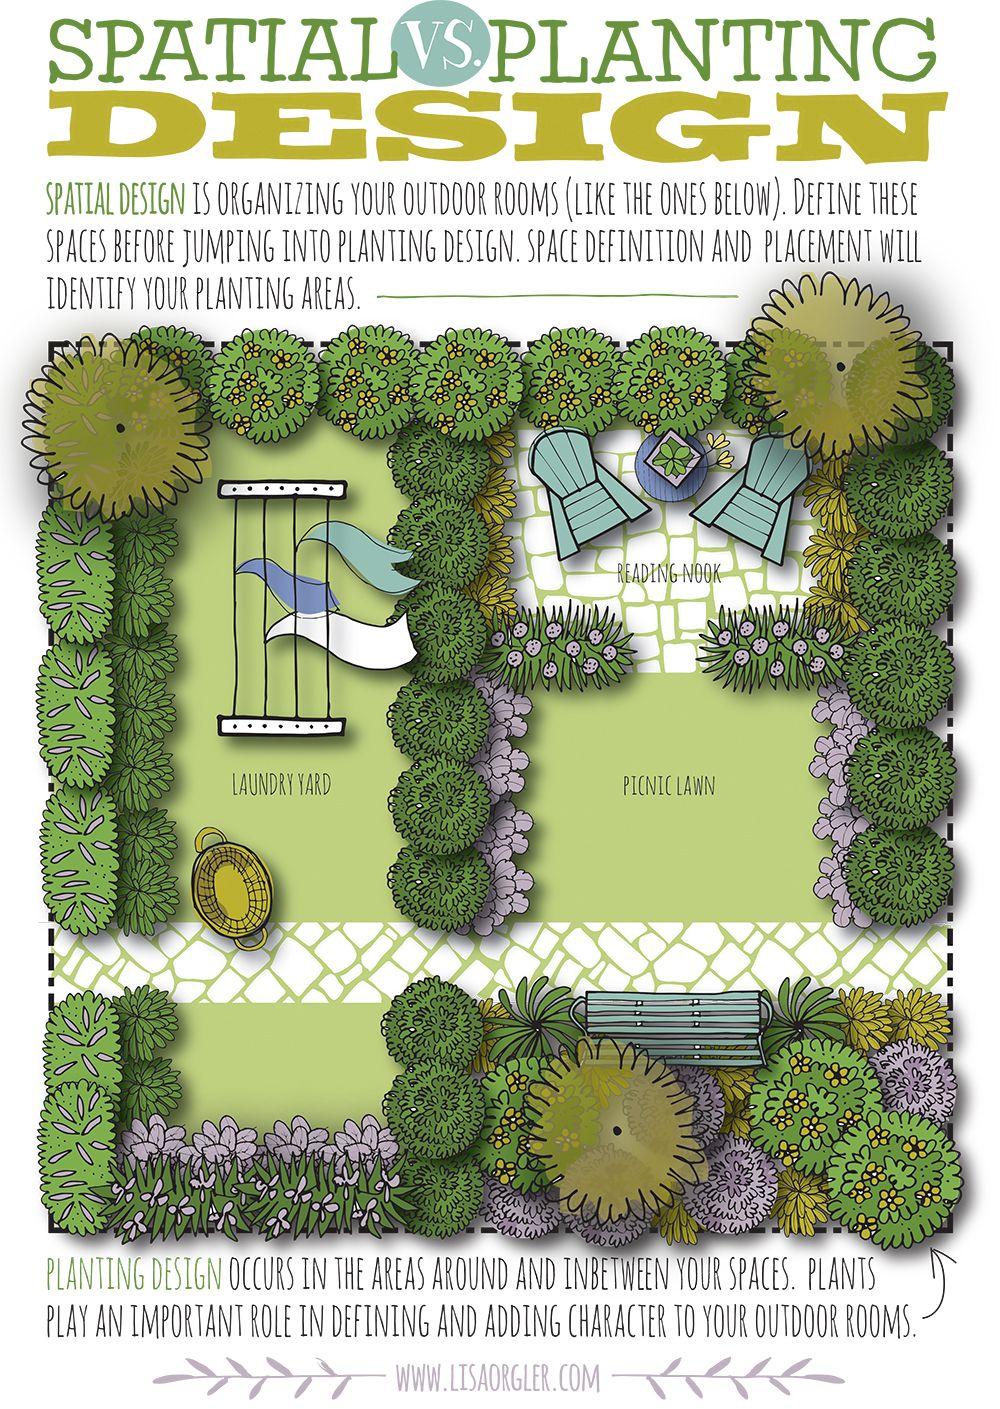 Spatial Vs Planting Design Garden Design Layout Landscaping Garden Design Layout Plant Design